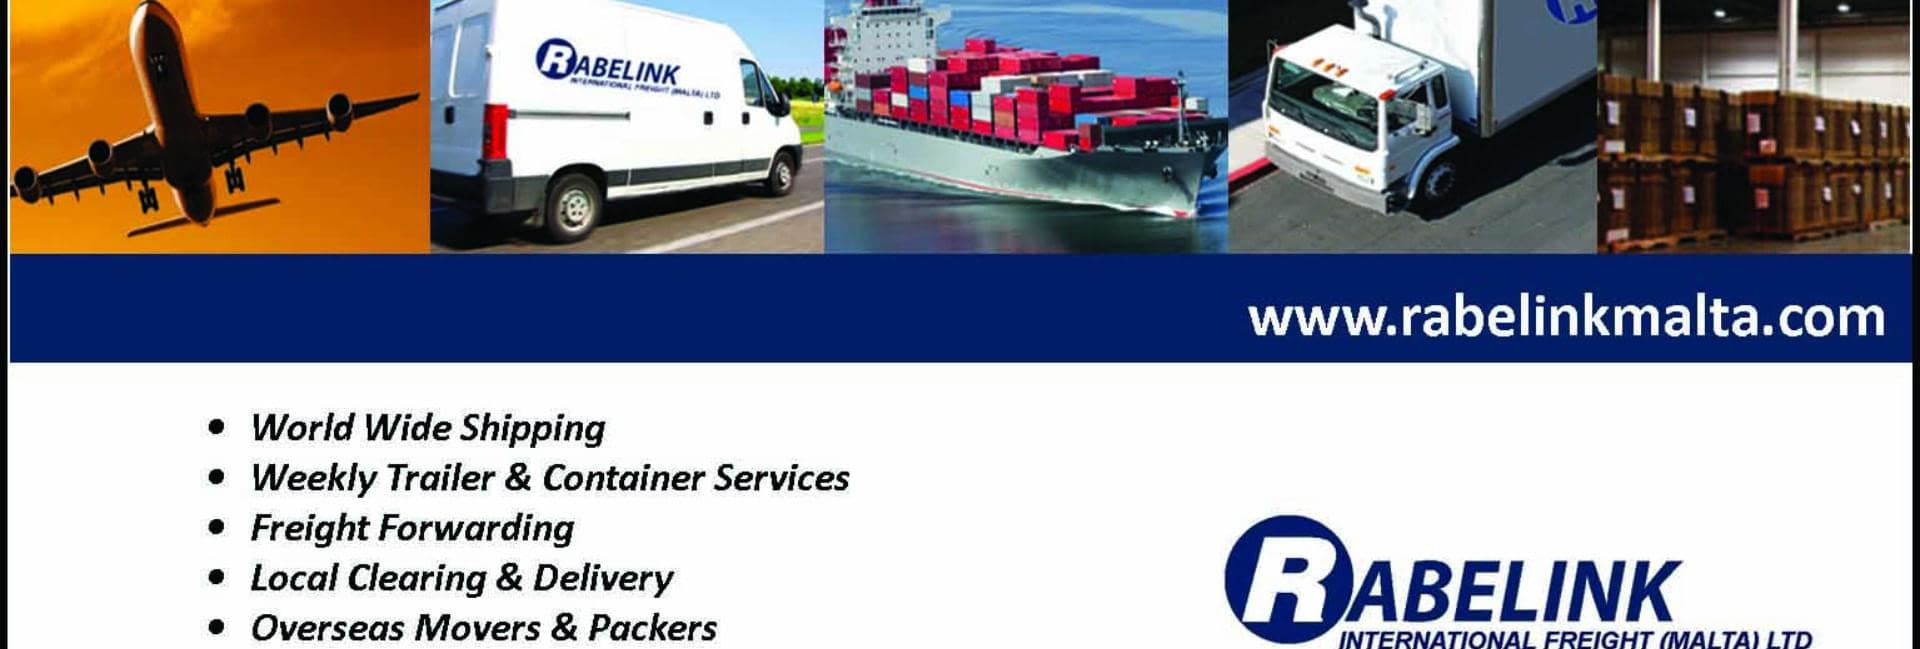 Rabelink International Freight (Malta) Ltd - Freight Forwarders in